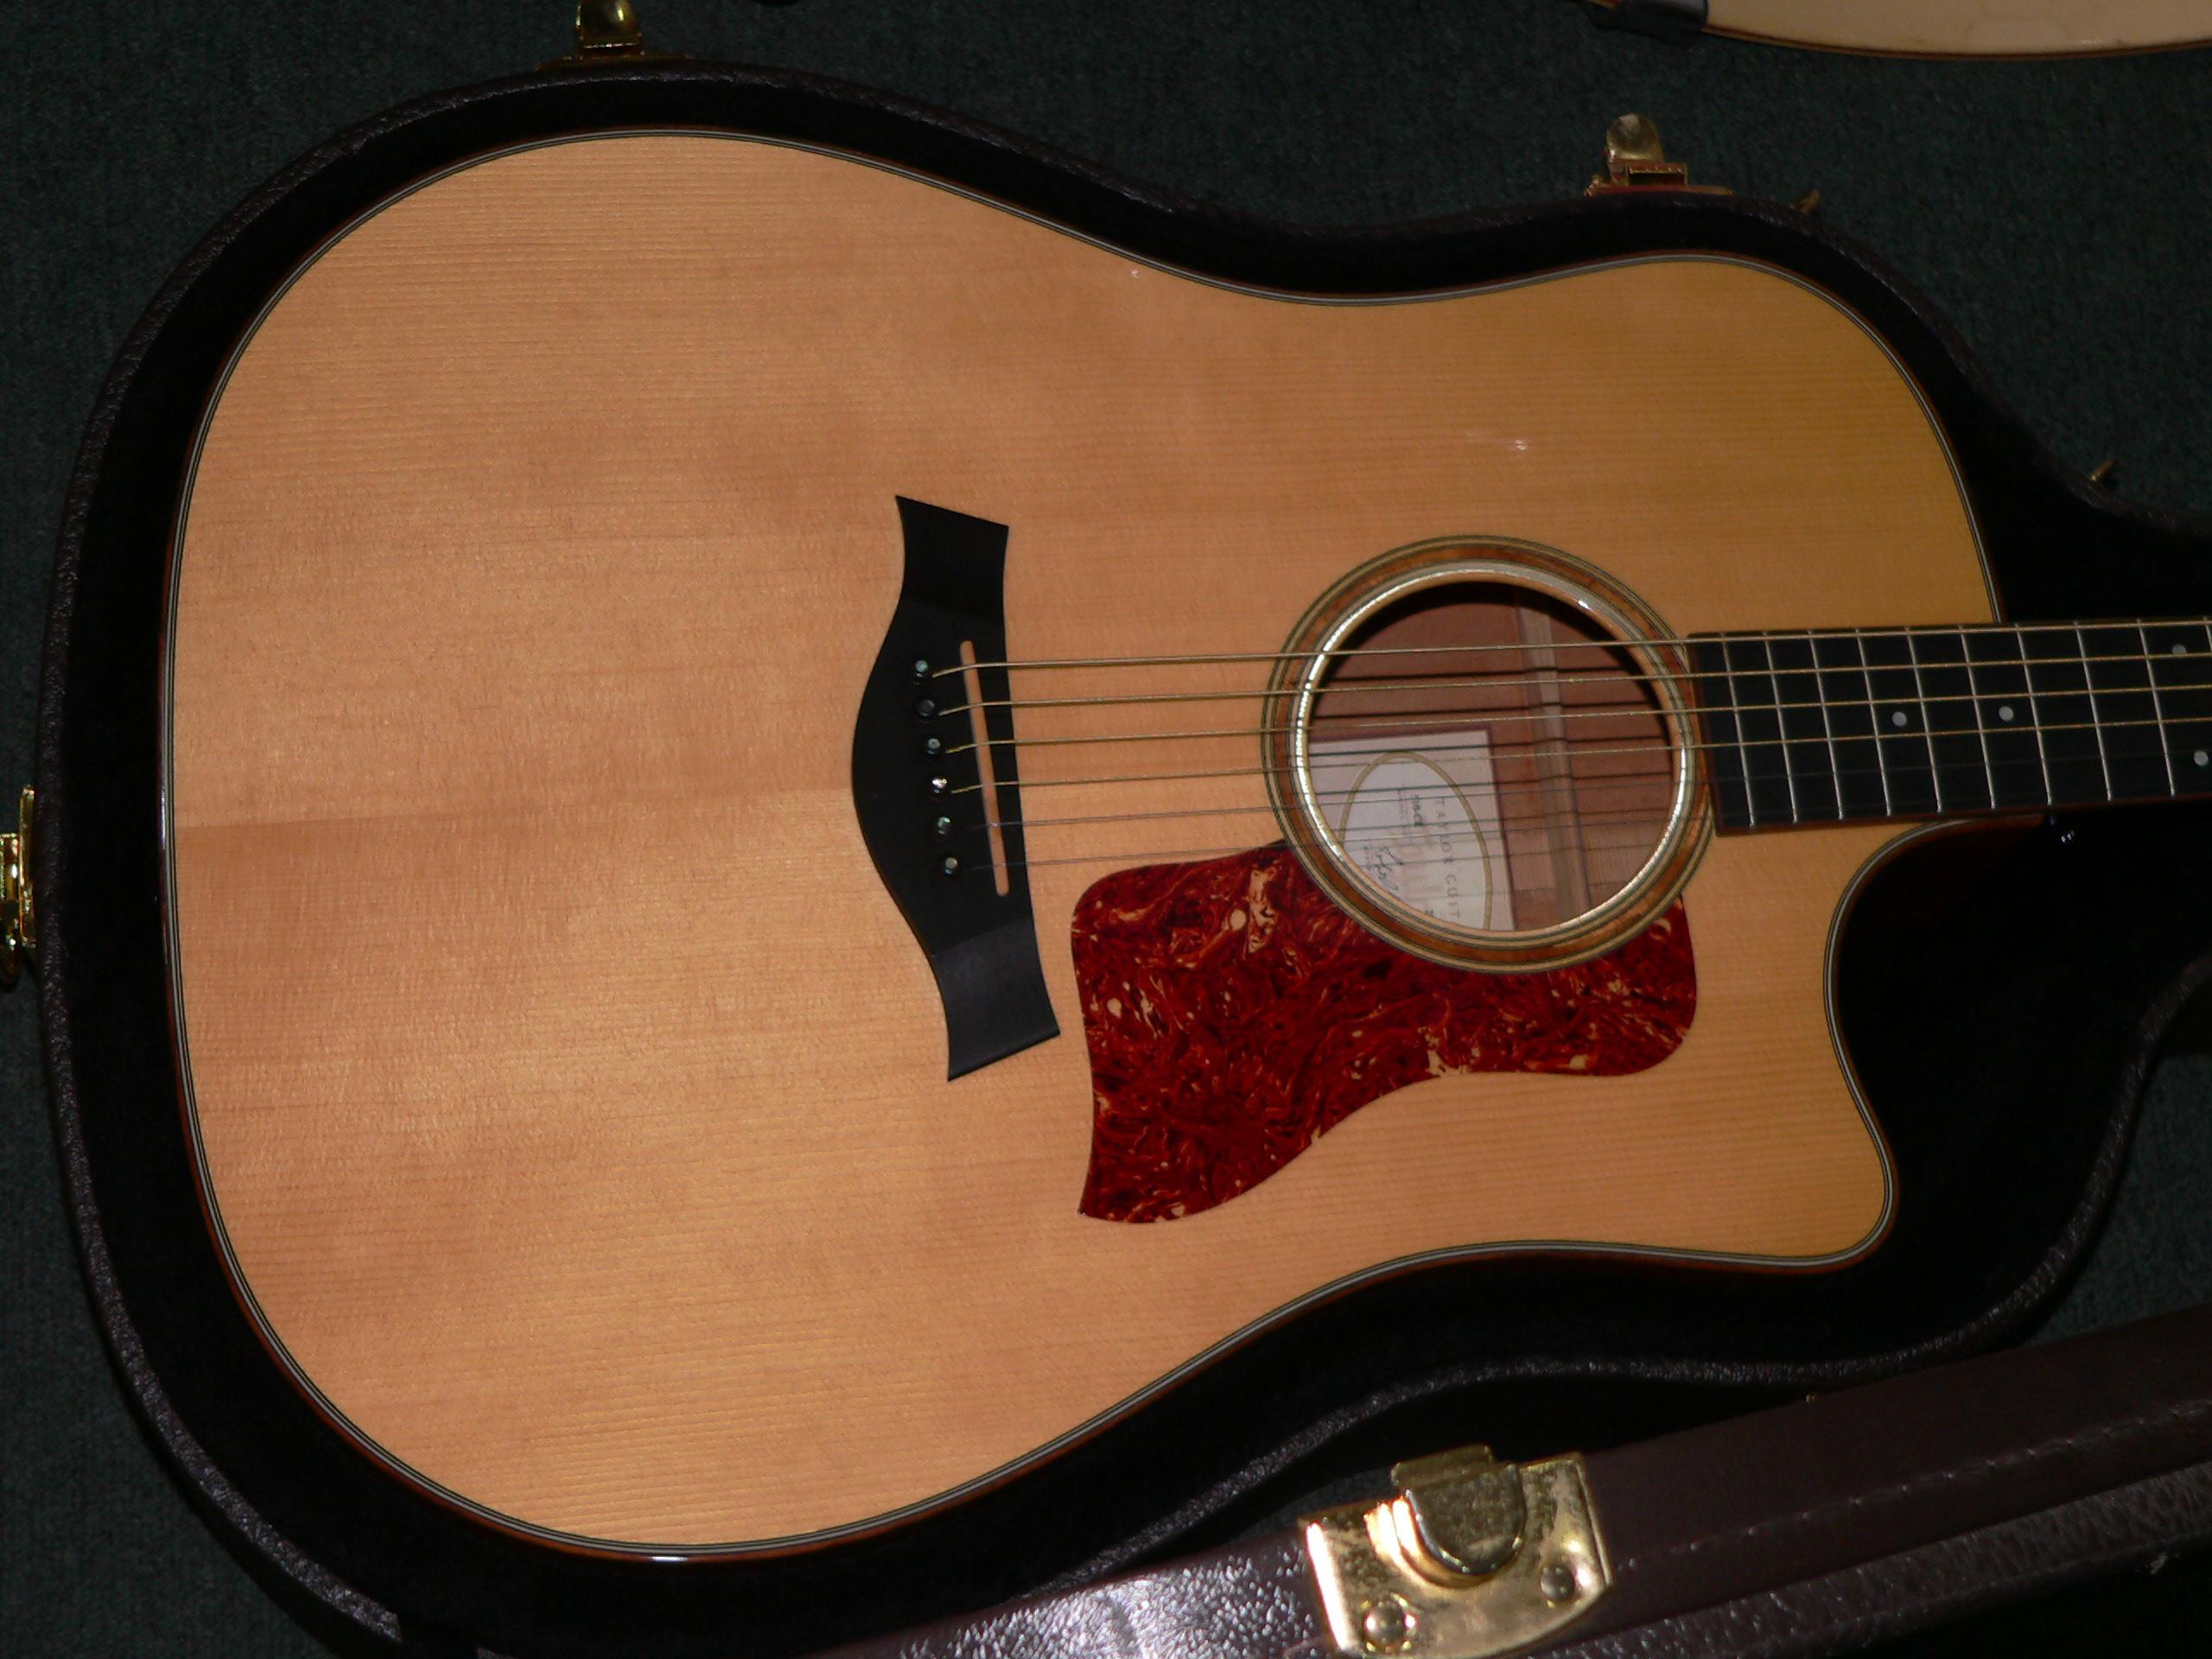 Taylor Guitars For Sale >> Taylor Guitars 510ce 2004 Natural Guitar For Sale